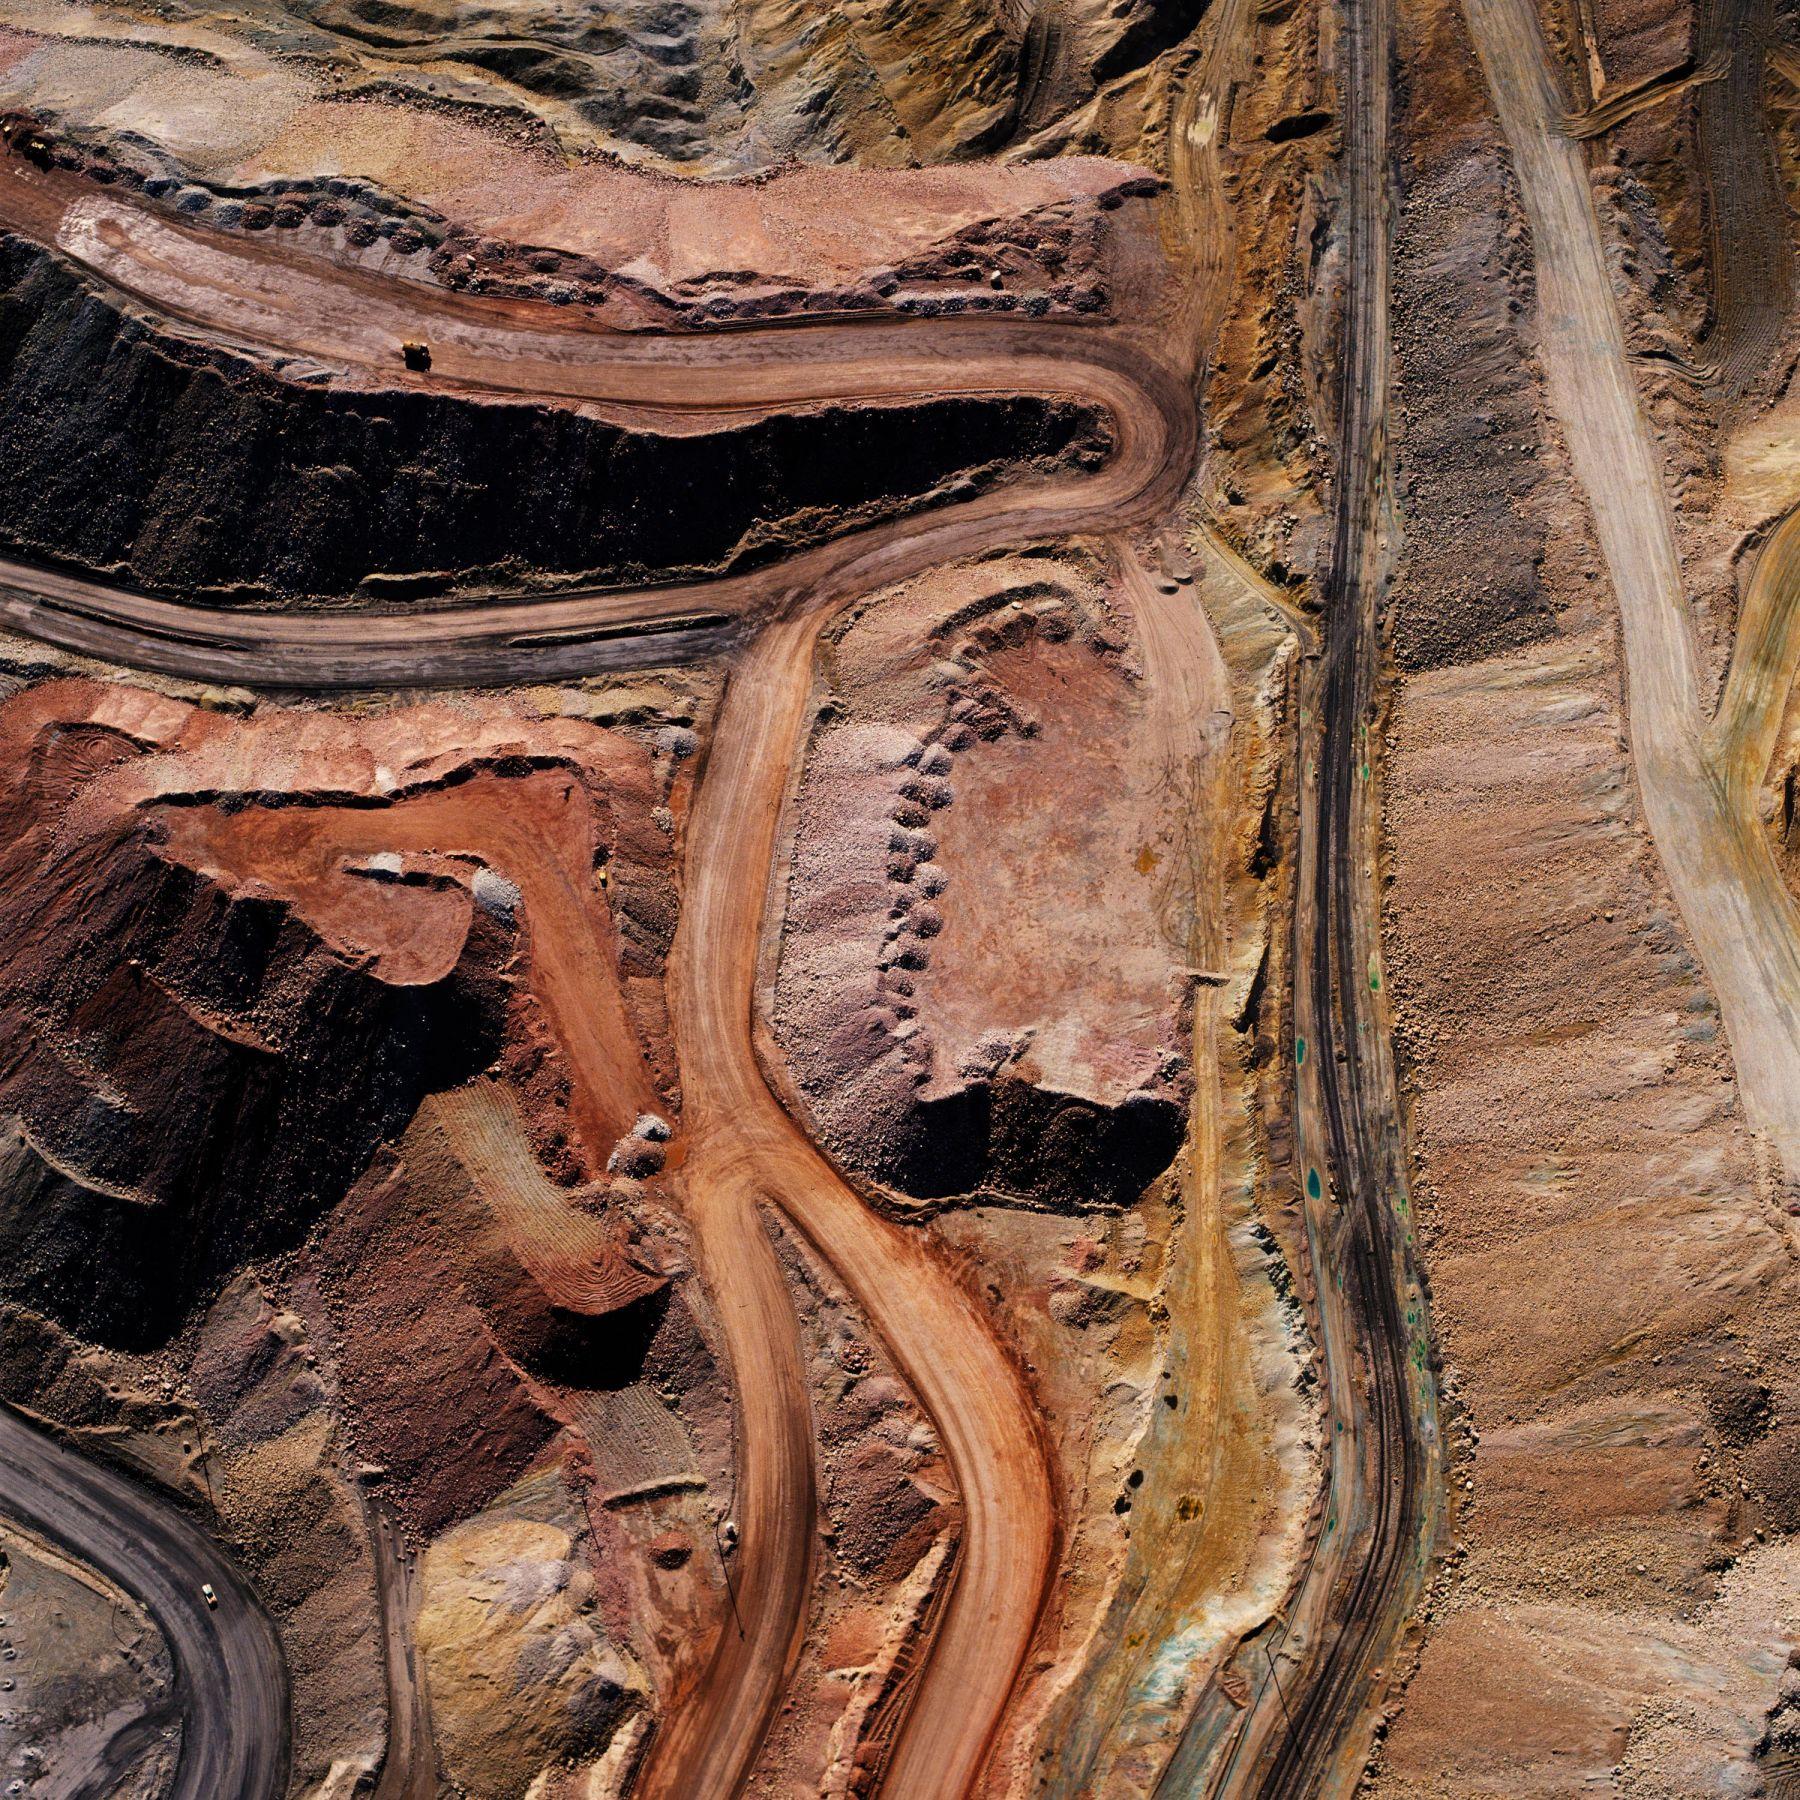 David Maisel, The Mining Project (Inspiration, AZ 1), 1989